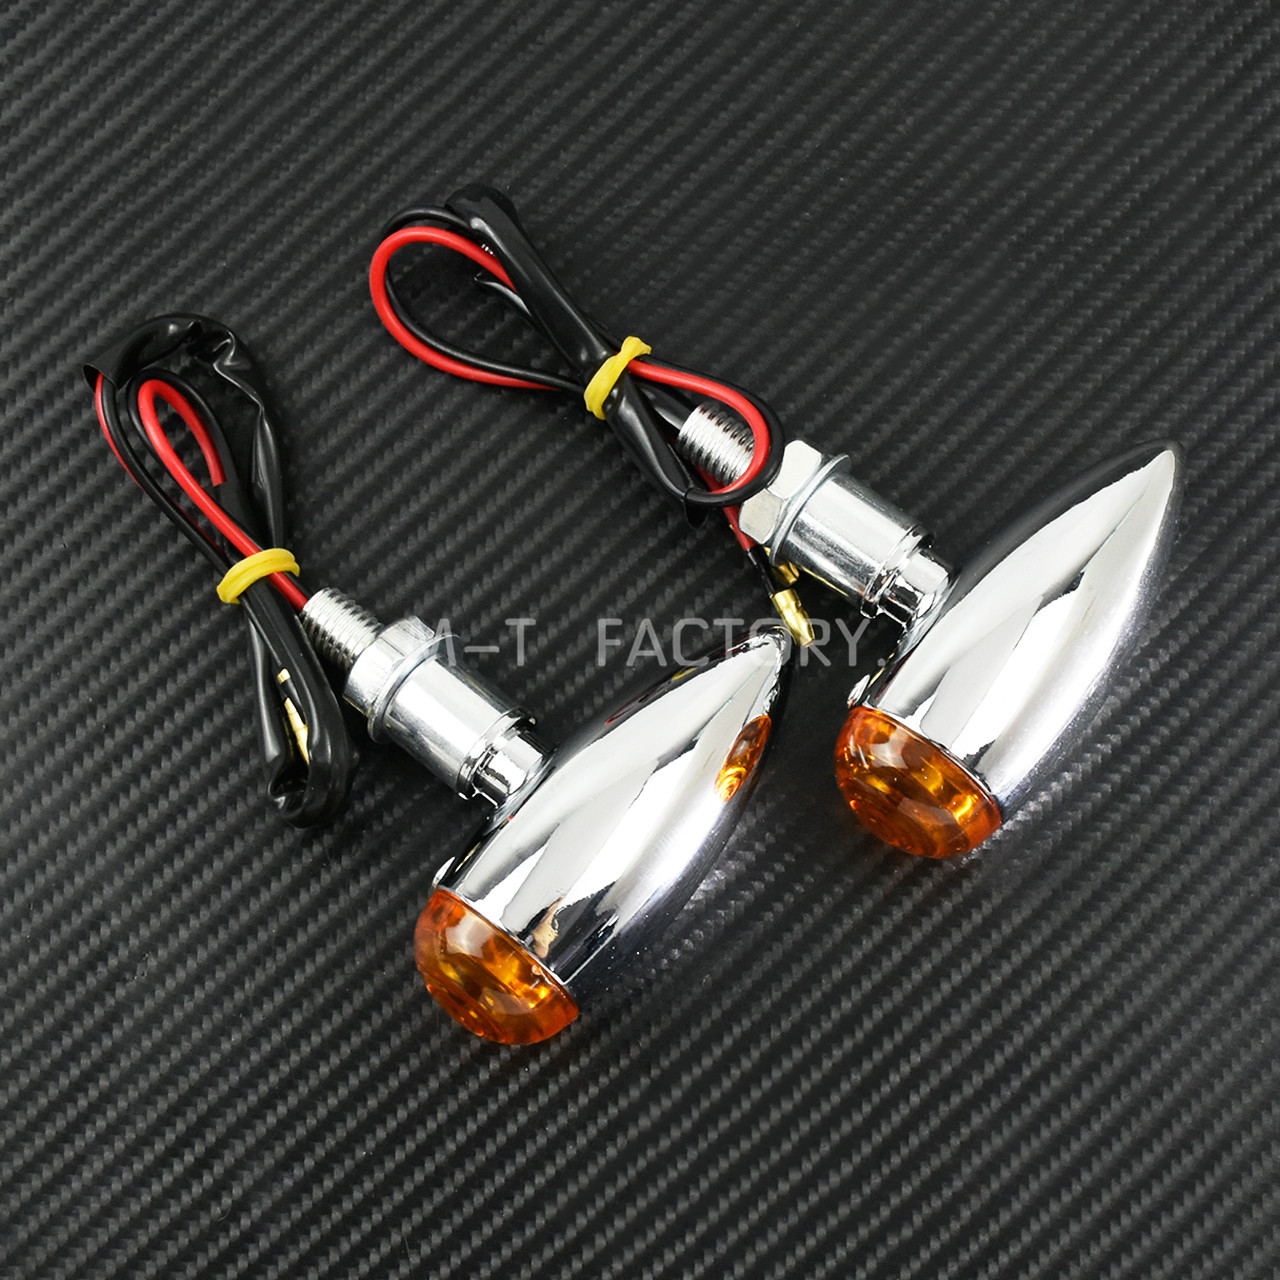 sinal de seta para motocicleta lampada cromada 01